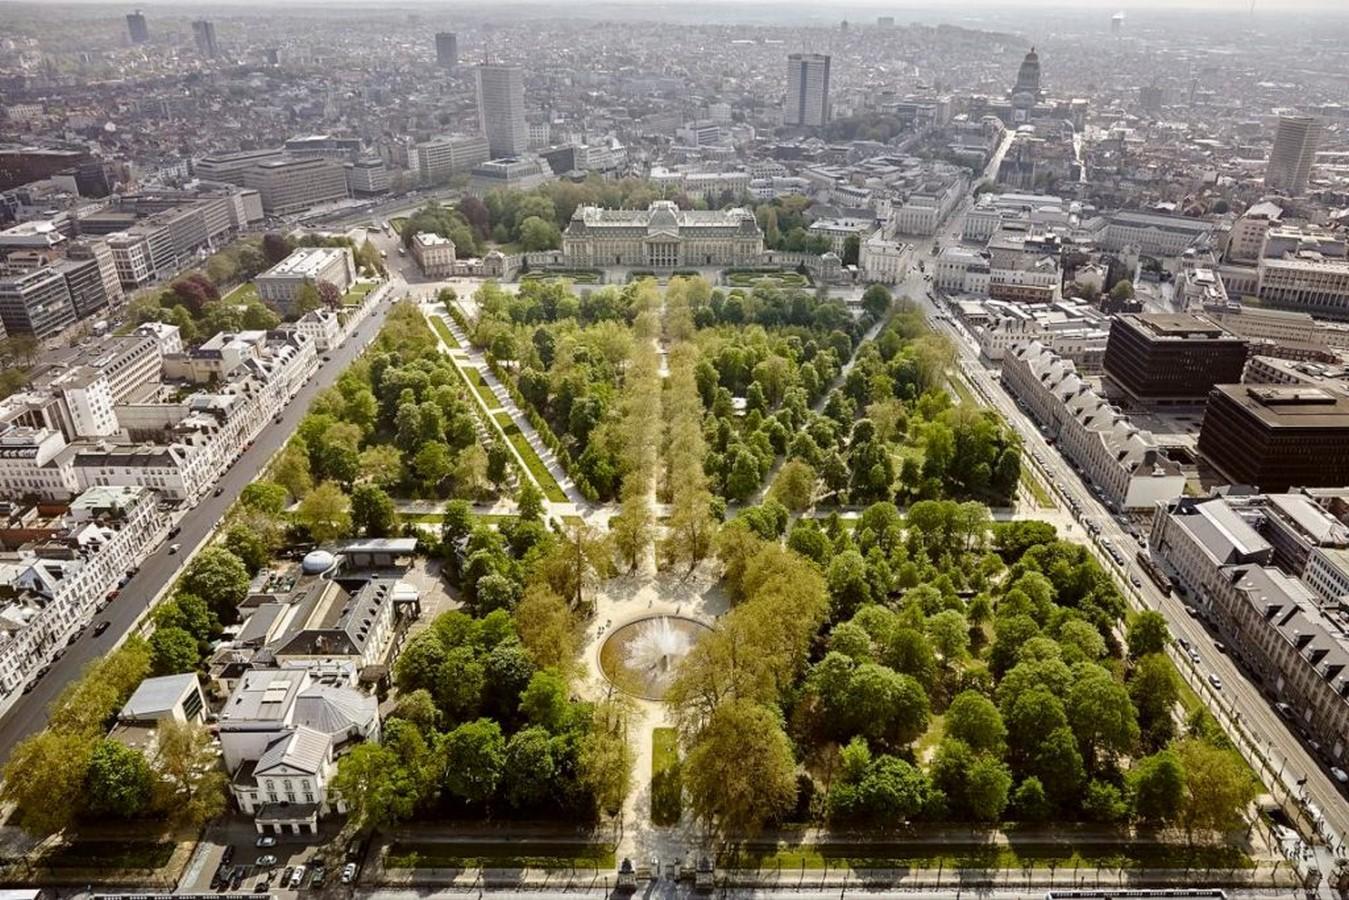 Royal Palace of Brussels by Architect Alphonse Balat: A resplendent vision of Grandeur - Sheet3